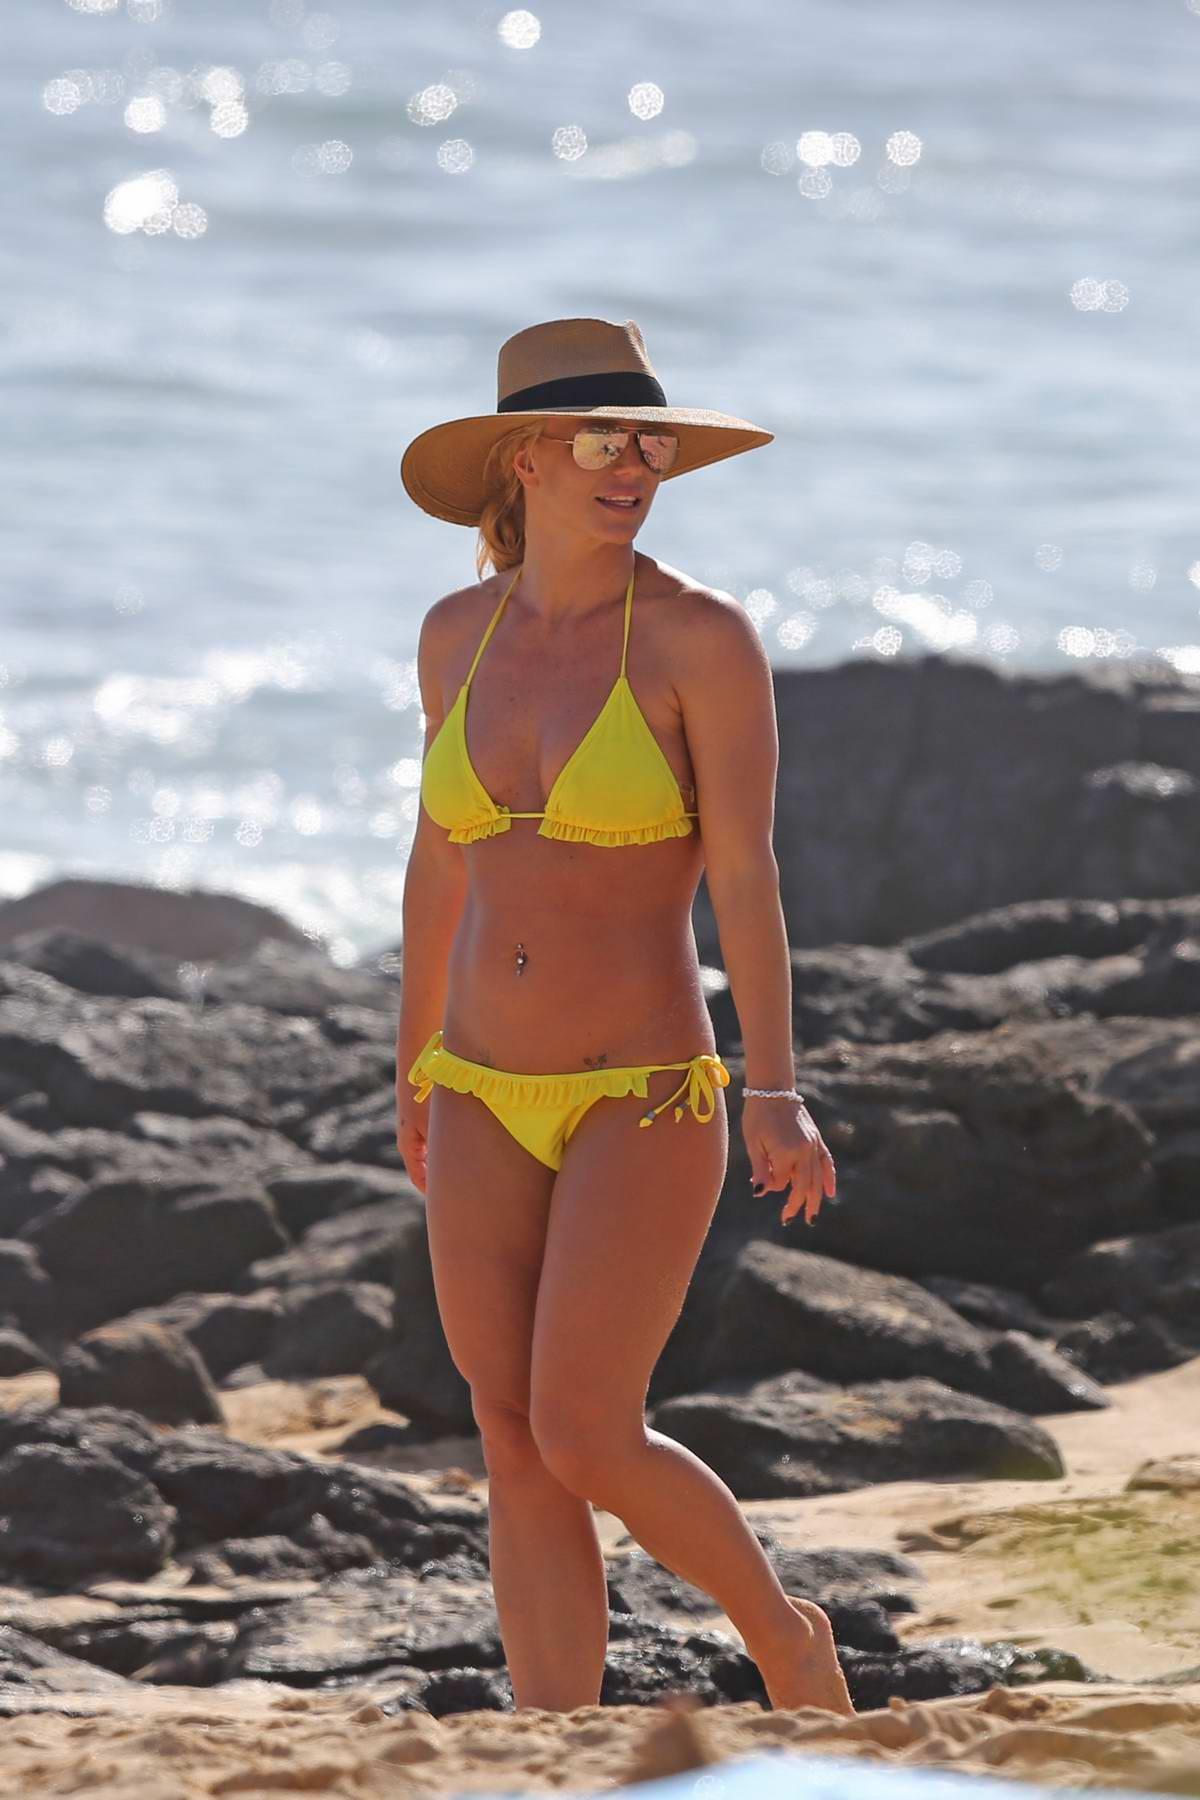 Britney Spears hits the beach in a yellow bikini in Hawaii